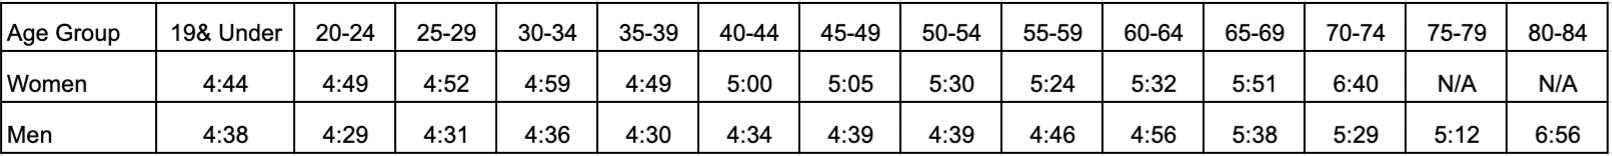 Average Finisher Times based on age group for the austin marathon